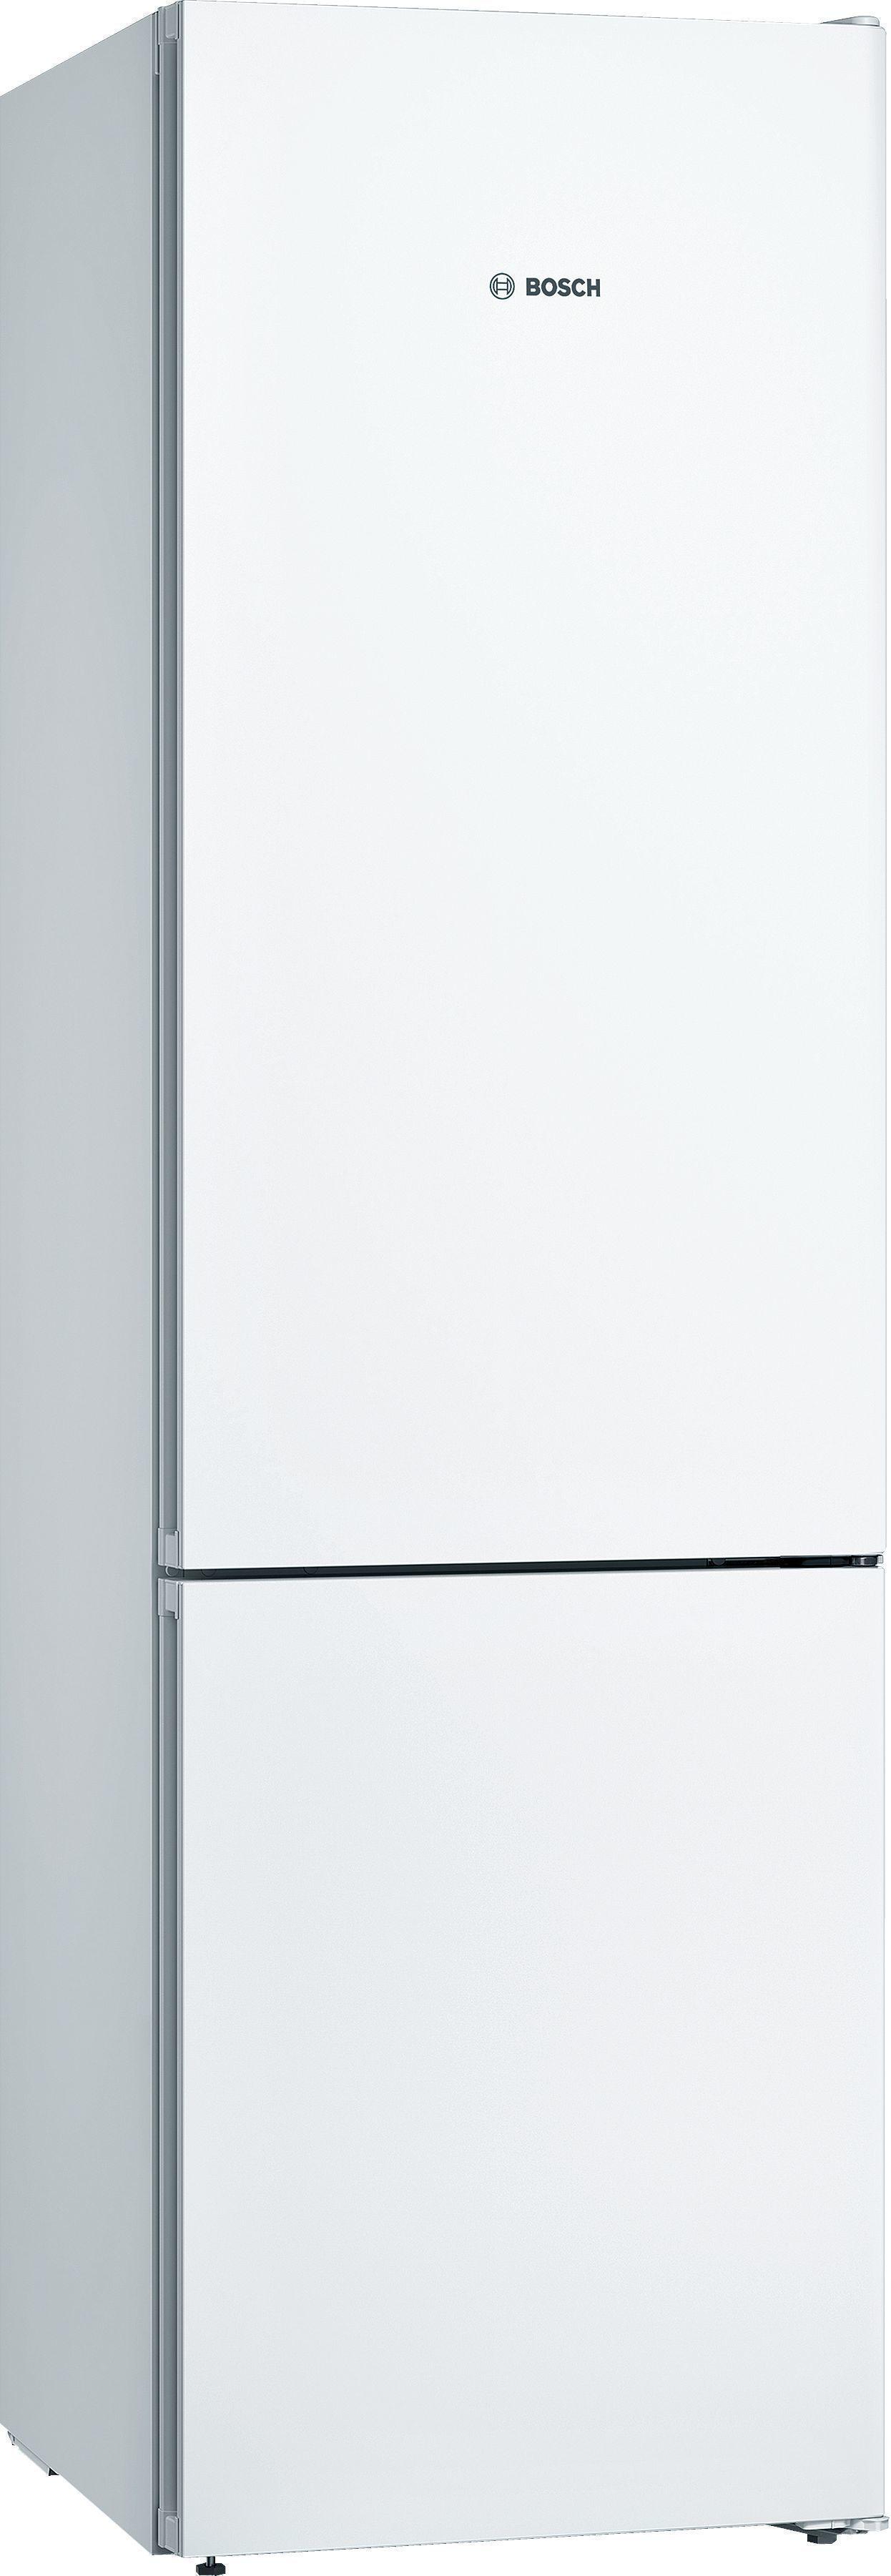 Frigorifico Bosch KGN39VWEA Combi 203 Nf A++